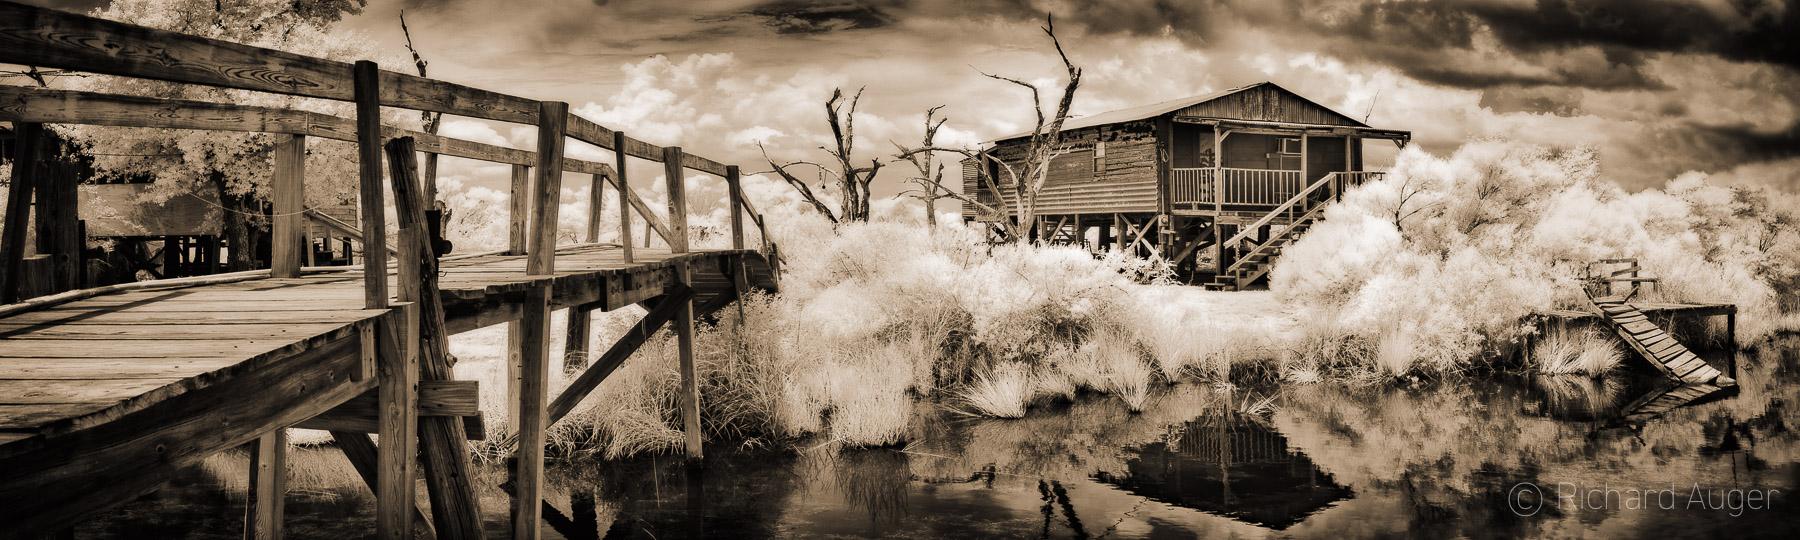 Isle De Dean Charles, Bayou, Louisiana, Fishing Shack, Bridge, Water, Swamp, Sepia